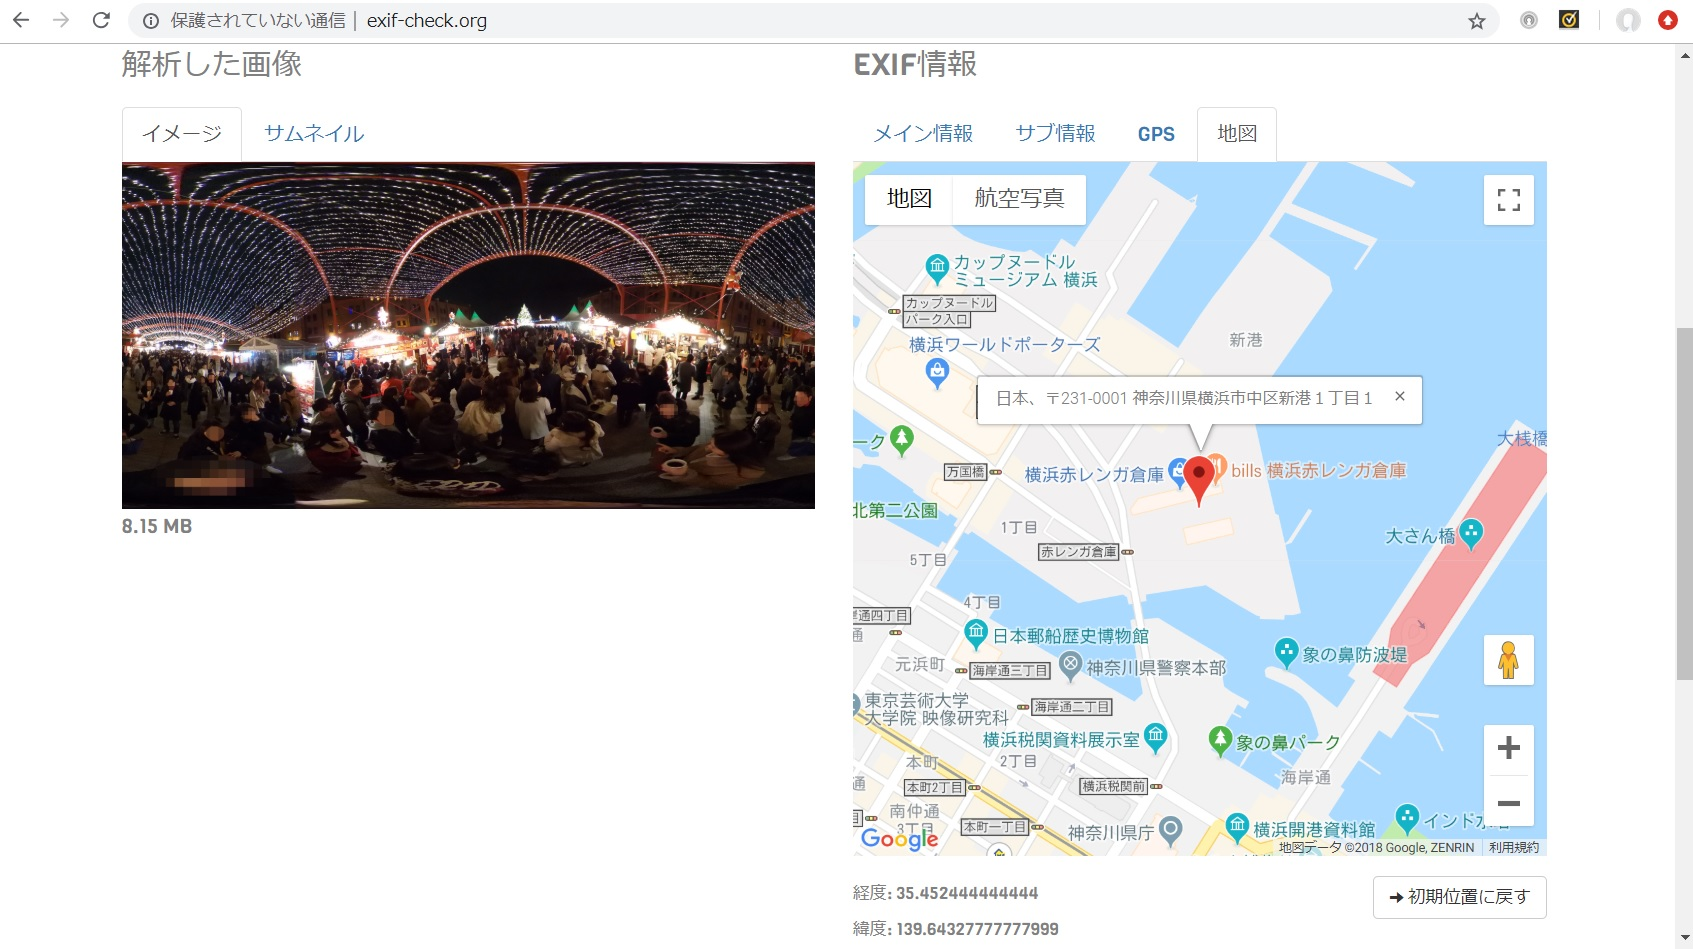 23_WEBページ表示例.jpg